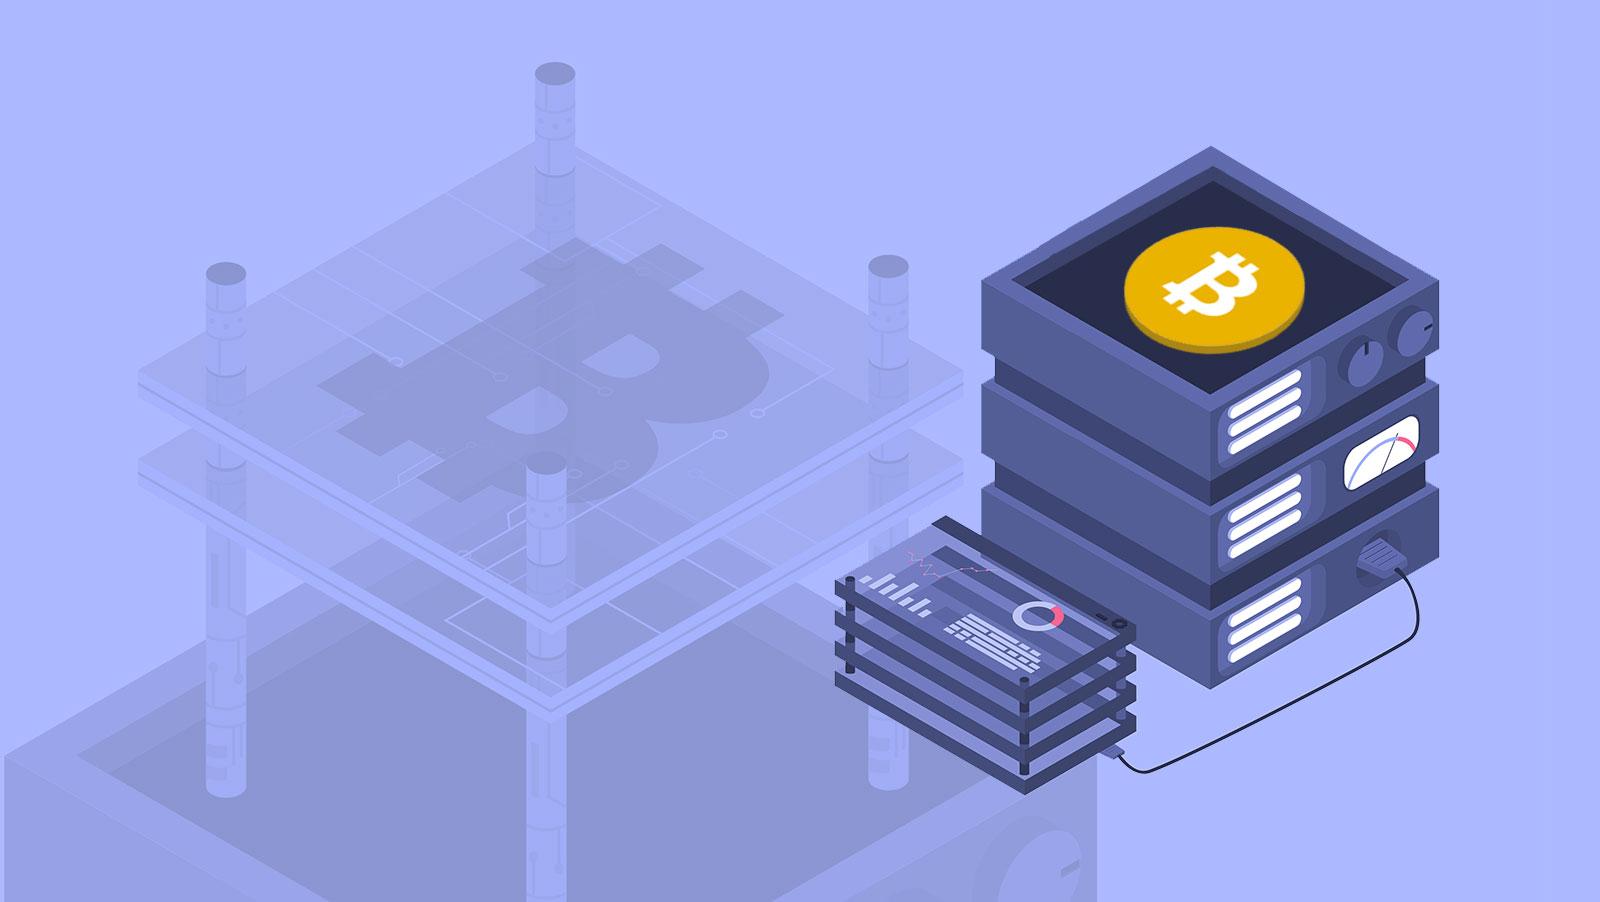 Bitcoin SV Quasar upgrade can be beneficial for gambling operators